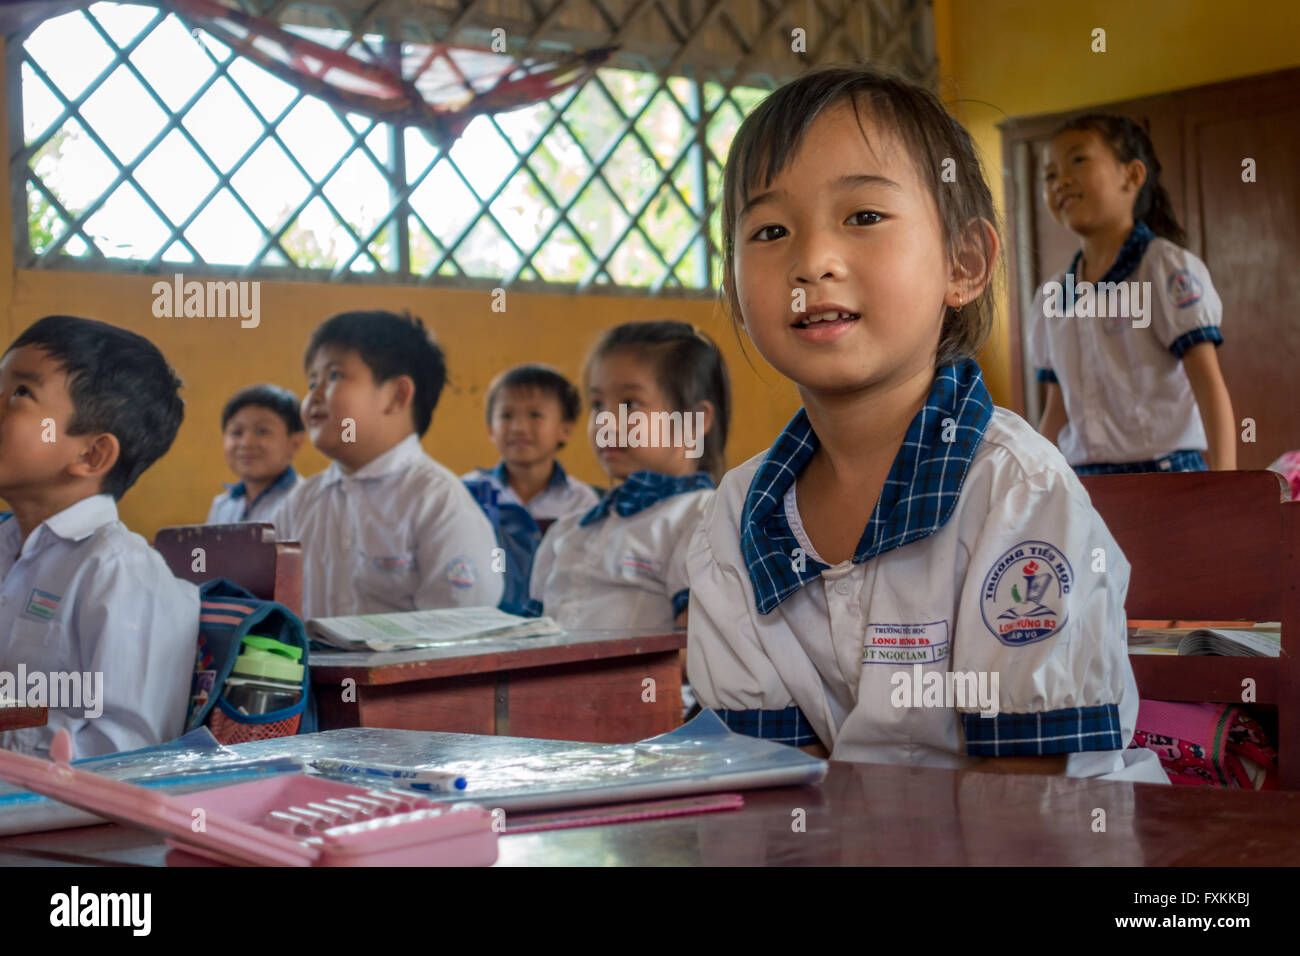 School children in school uniform learning in a small village school on the Mekong Delta, Vietnam - Stock Image